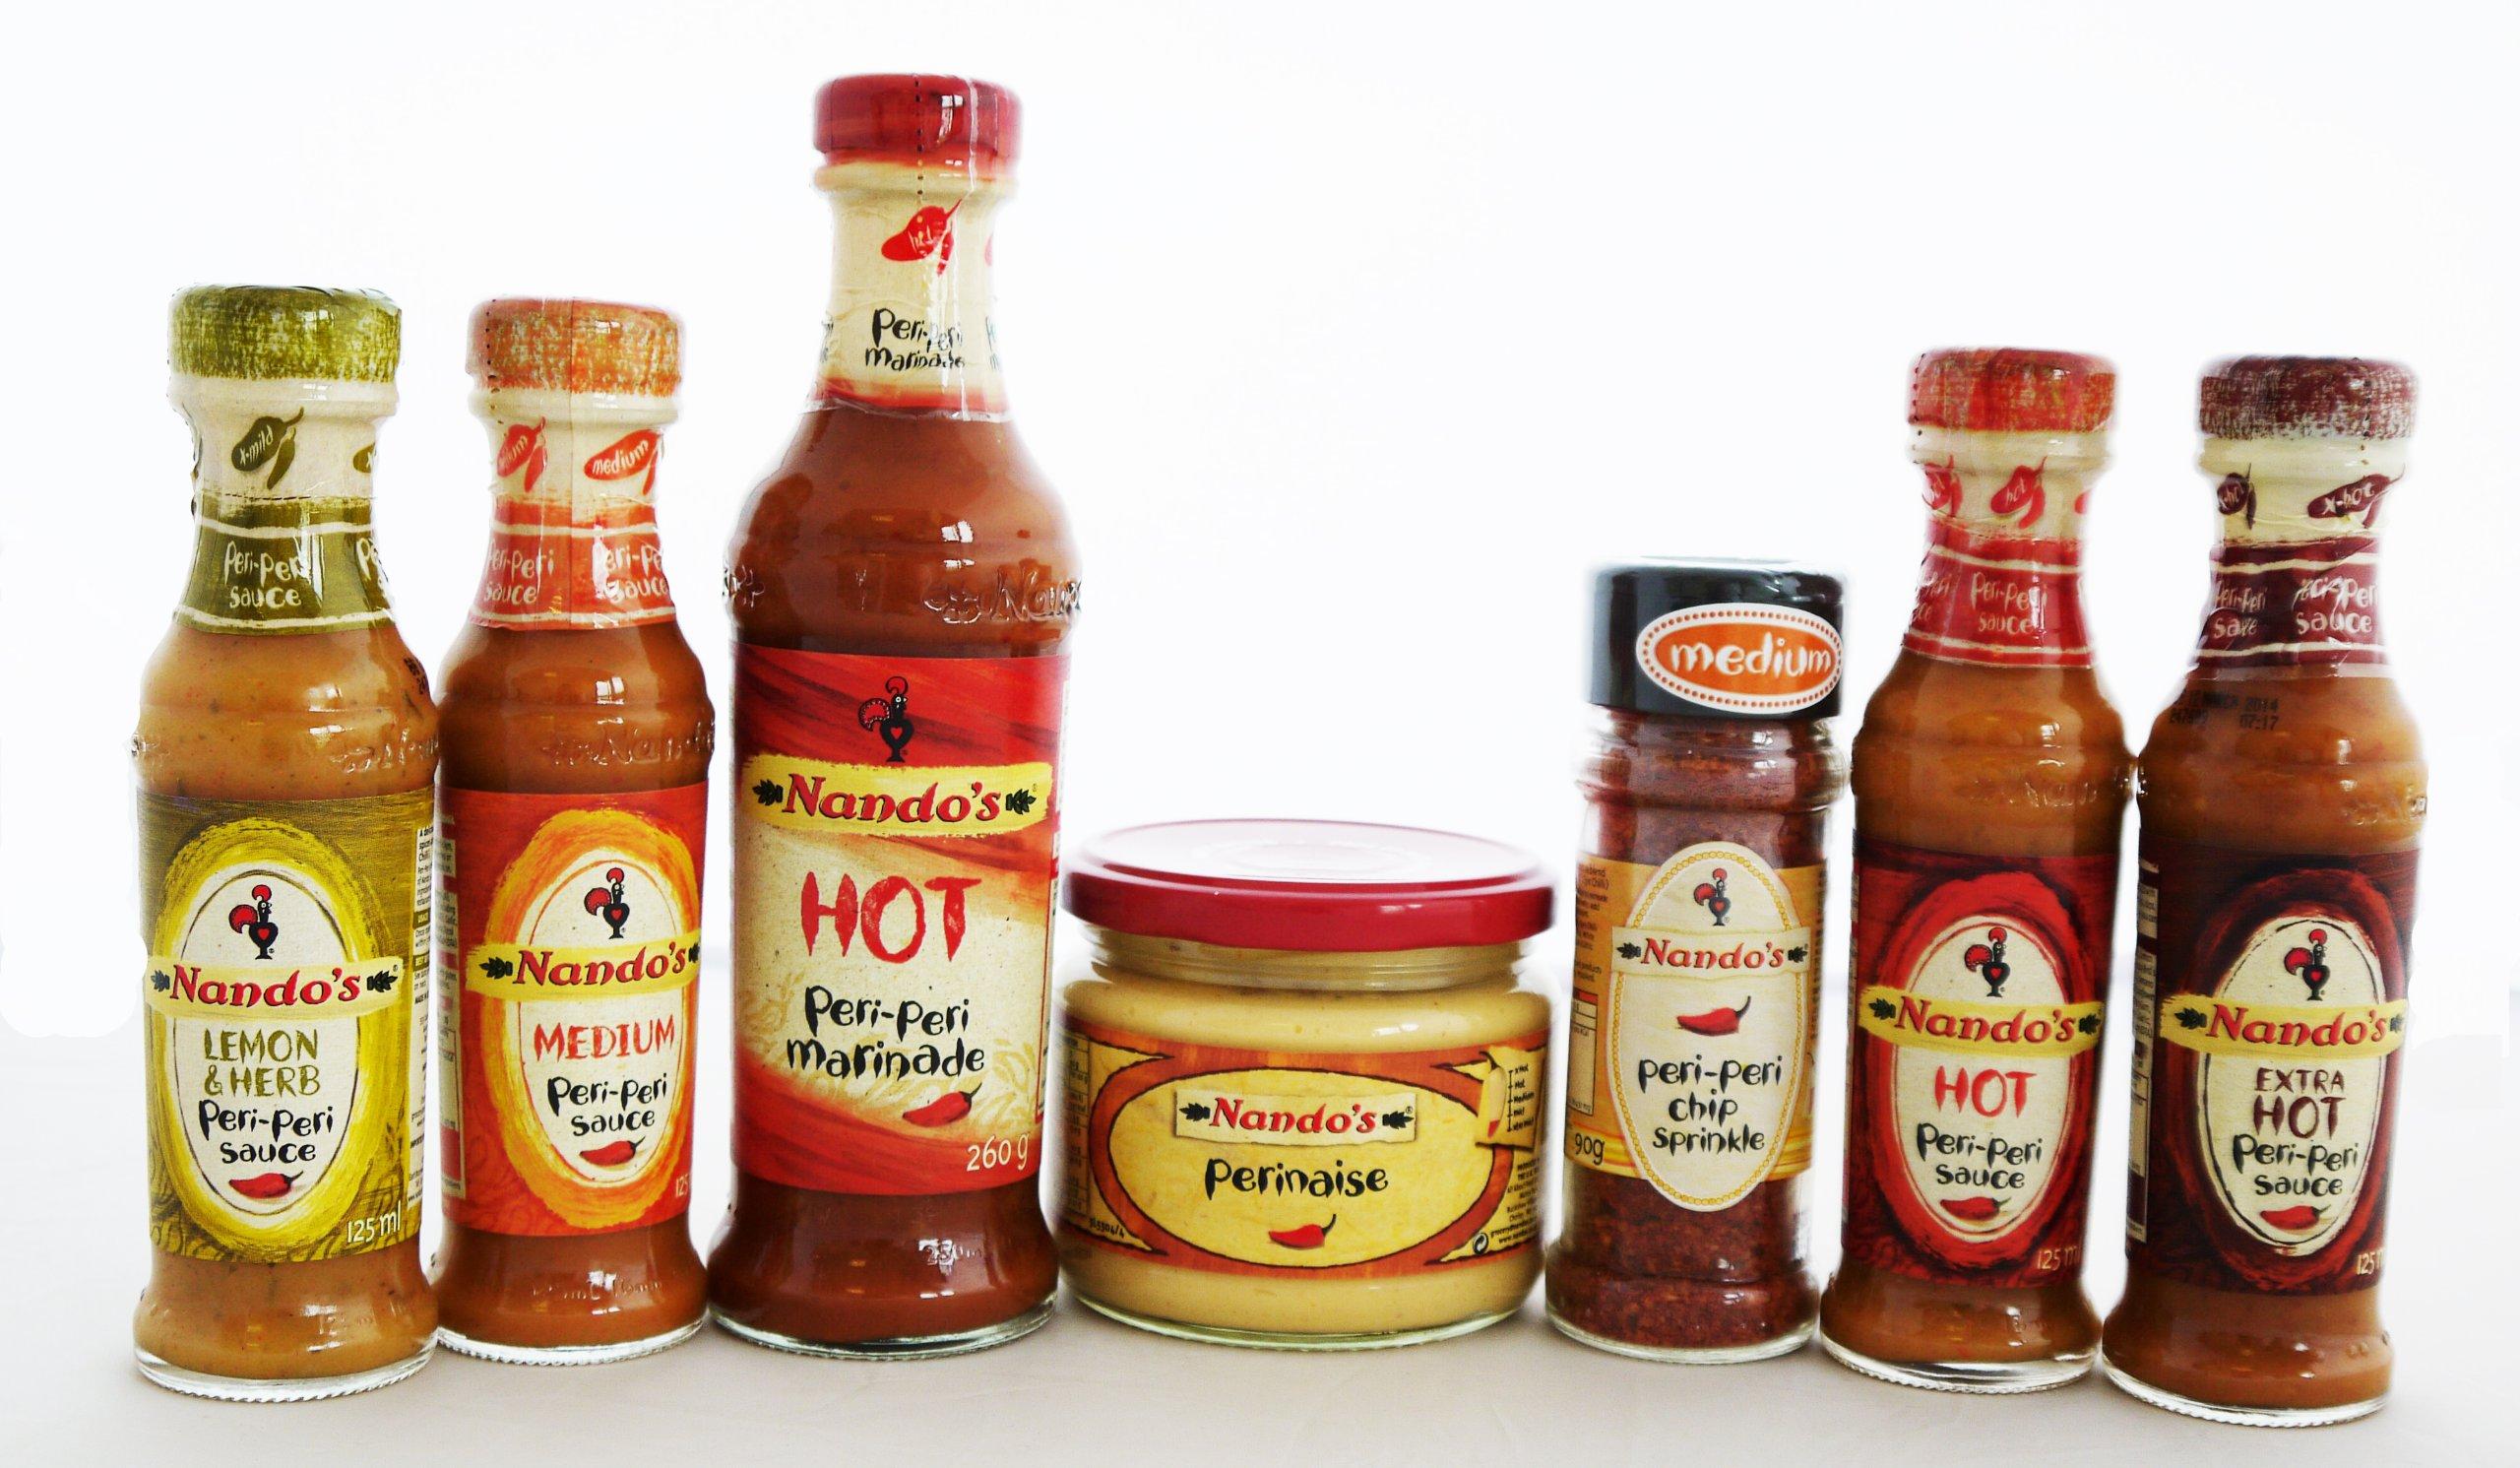 Cooking Marvellous Nandos Peri Peri - Hot Marinade, Perinaise, Peri Peri Chip Sprinkles, Lemon & Herb (Mild), Medium, Hot And Extra Hot Sauce. by Cooking Marvellous